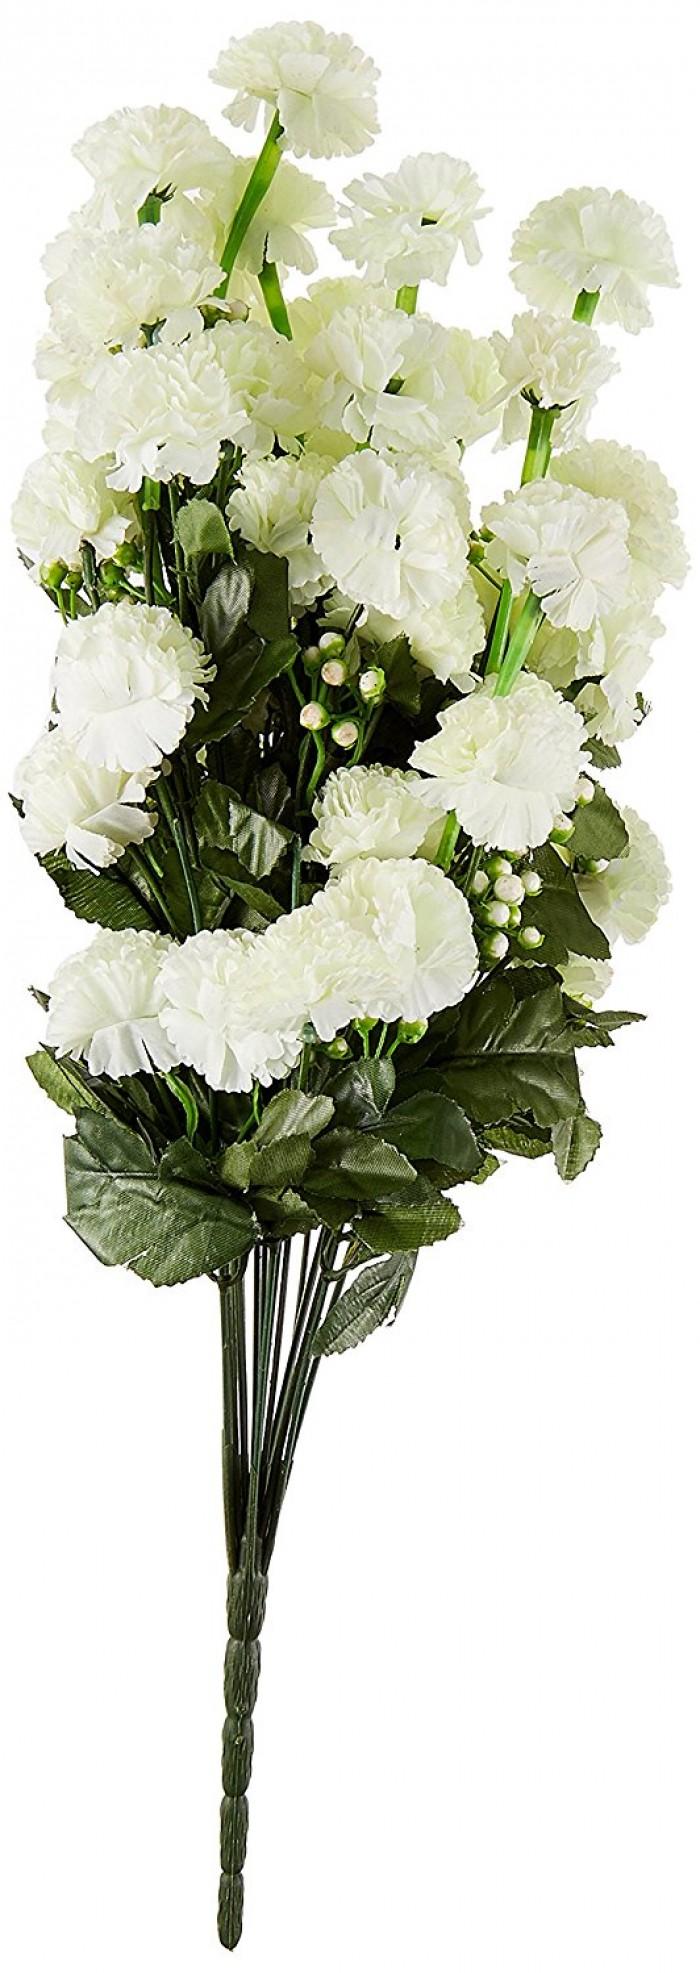 Buy FourwallsMarigold Plastic Artificial Flower (9.4 Cm, White) Online